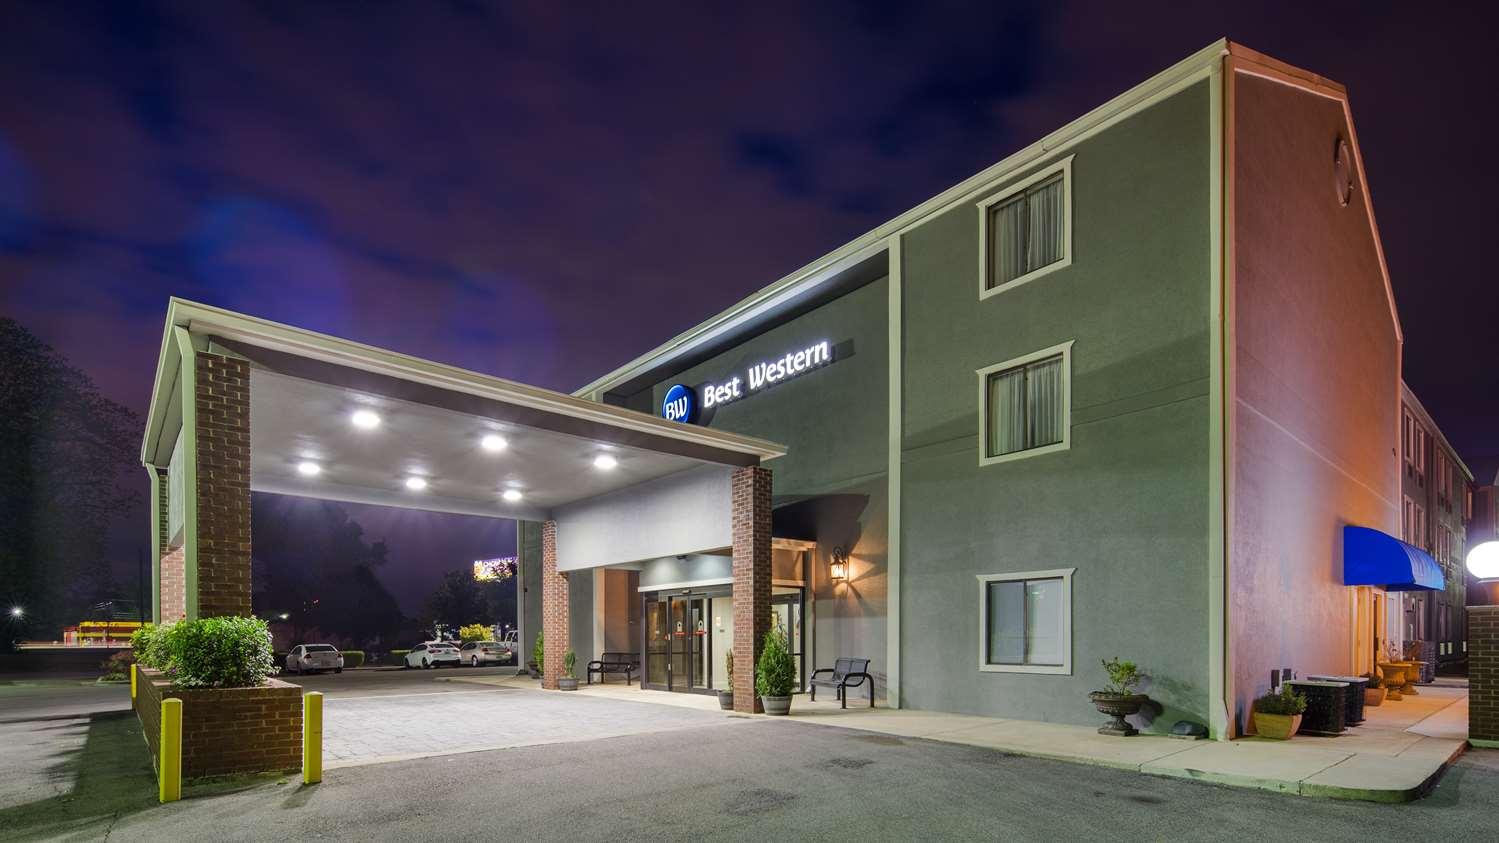 Exterior view - Best Western River City Hotel Decatur